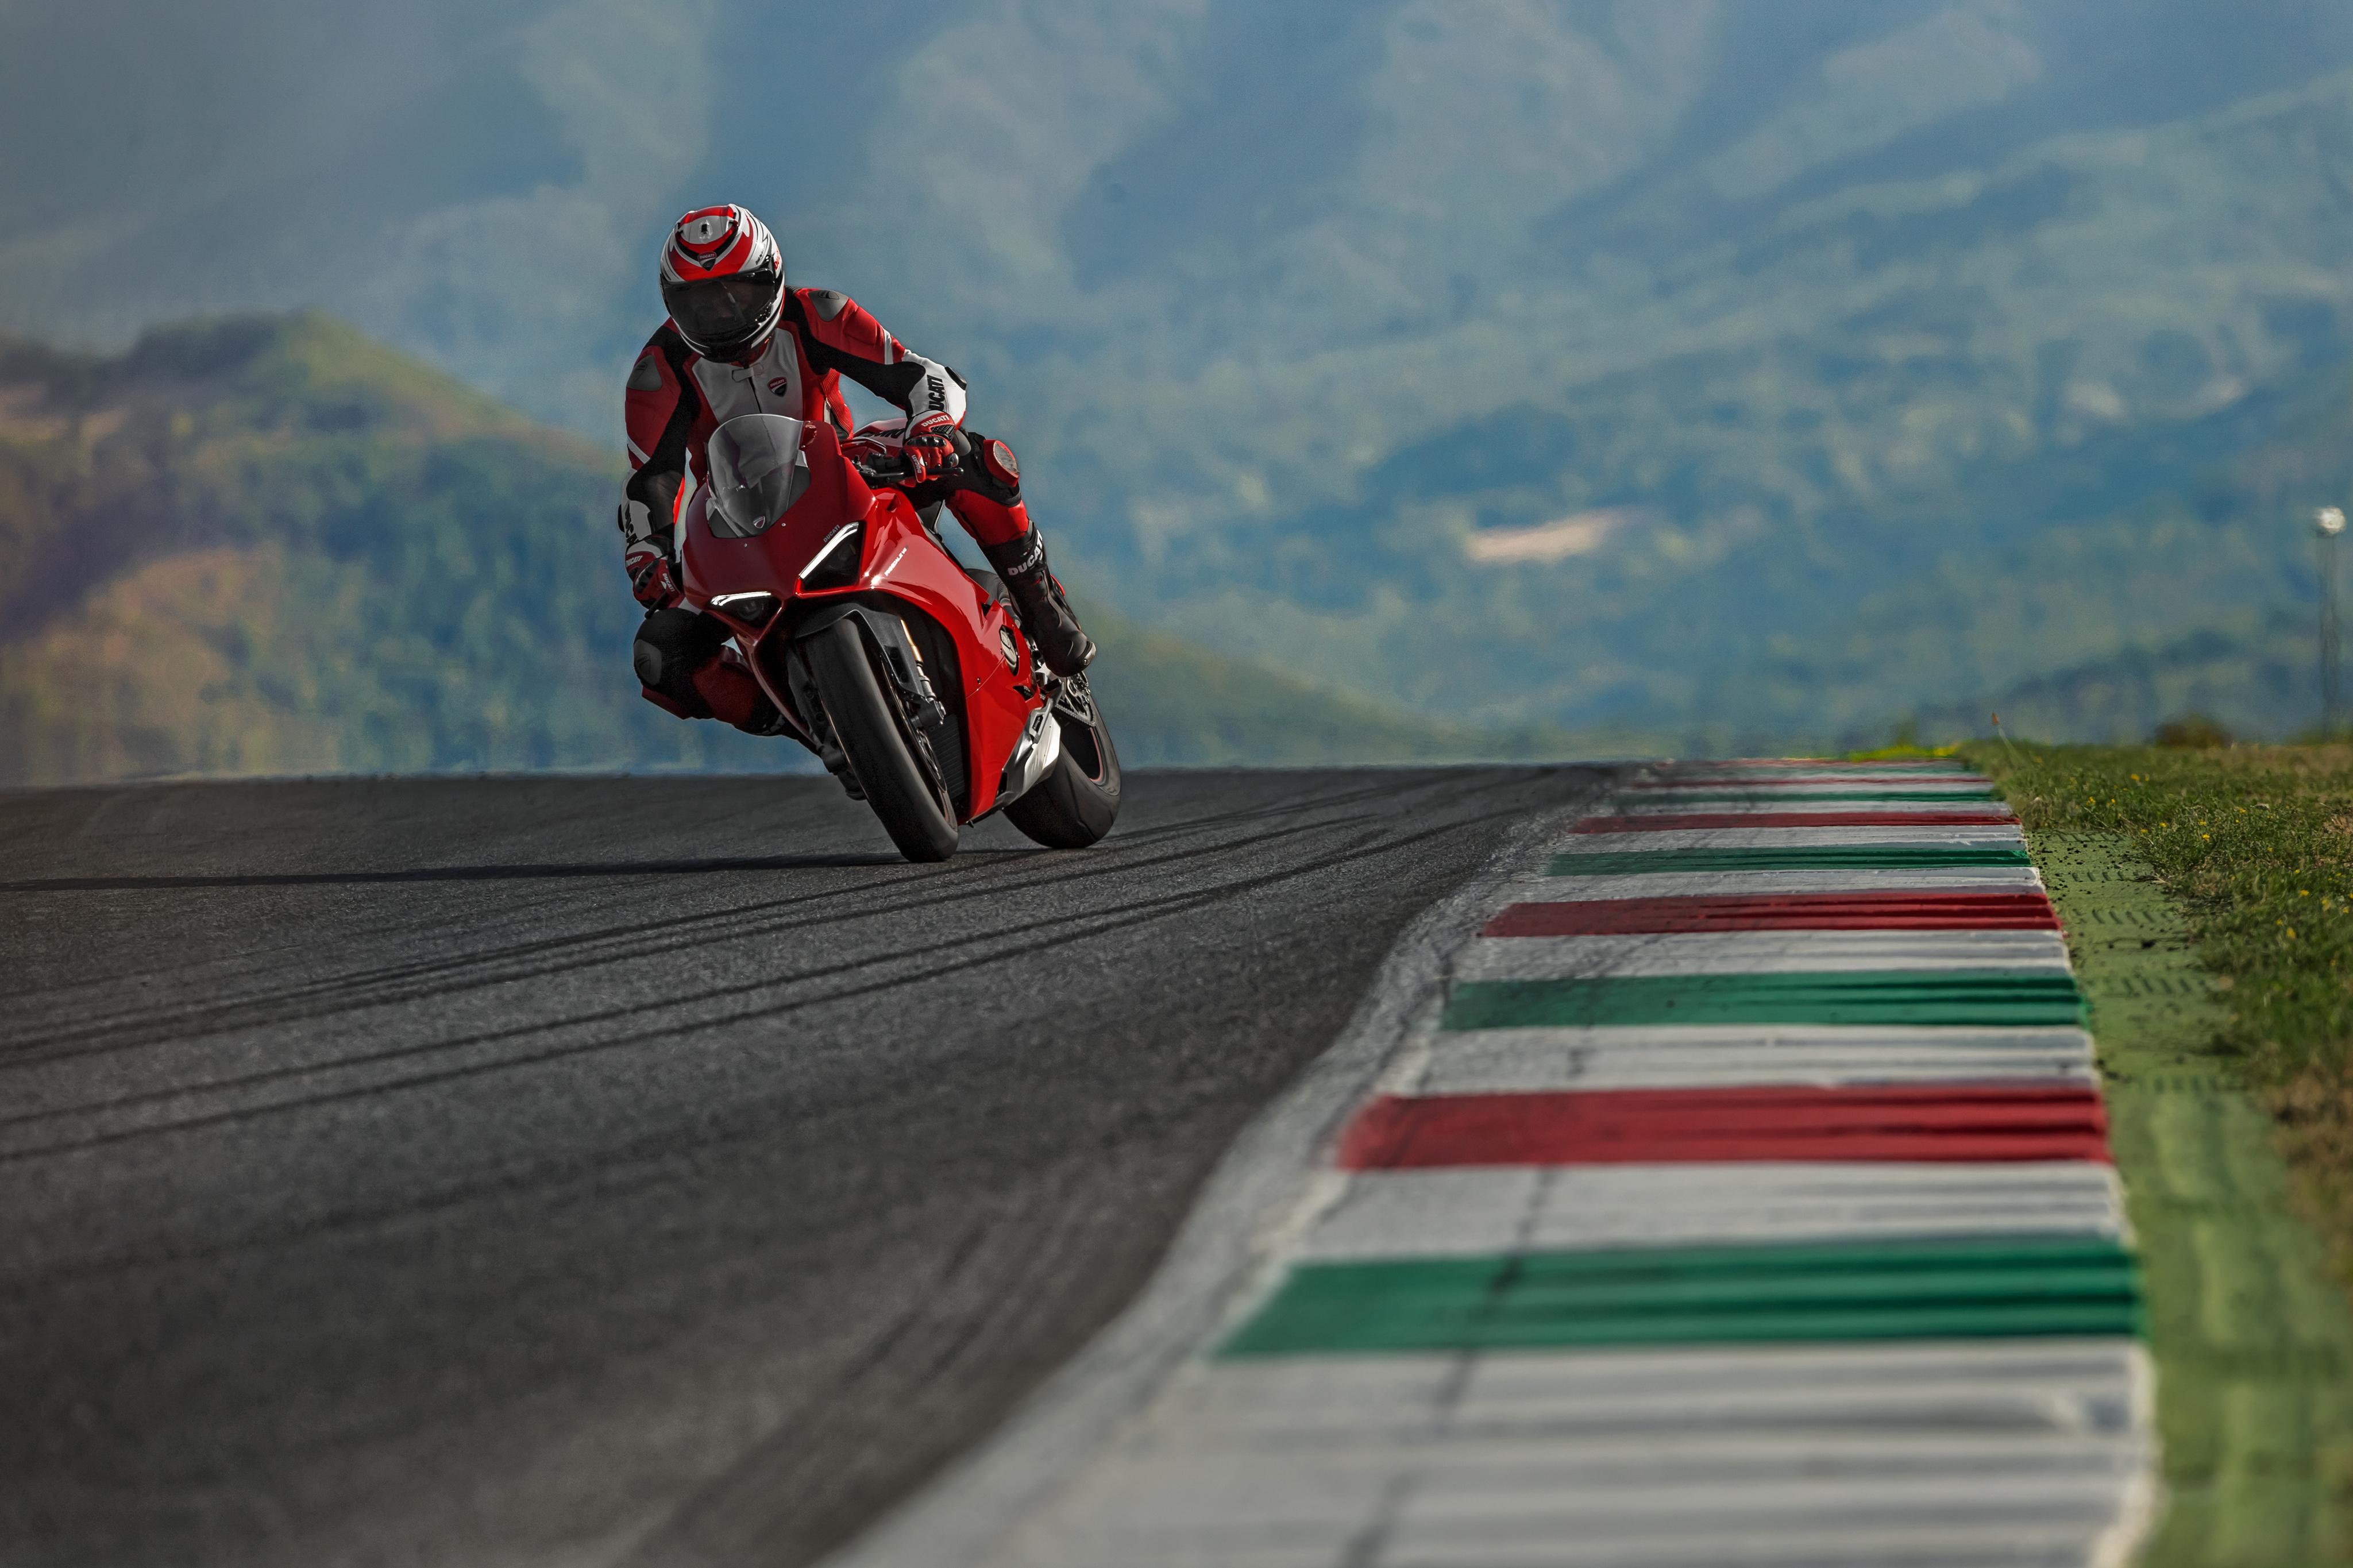 2018 Ducati Panigale V4 4k, HD Bikes, 4k Wallpapers